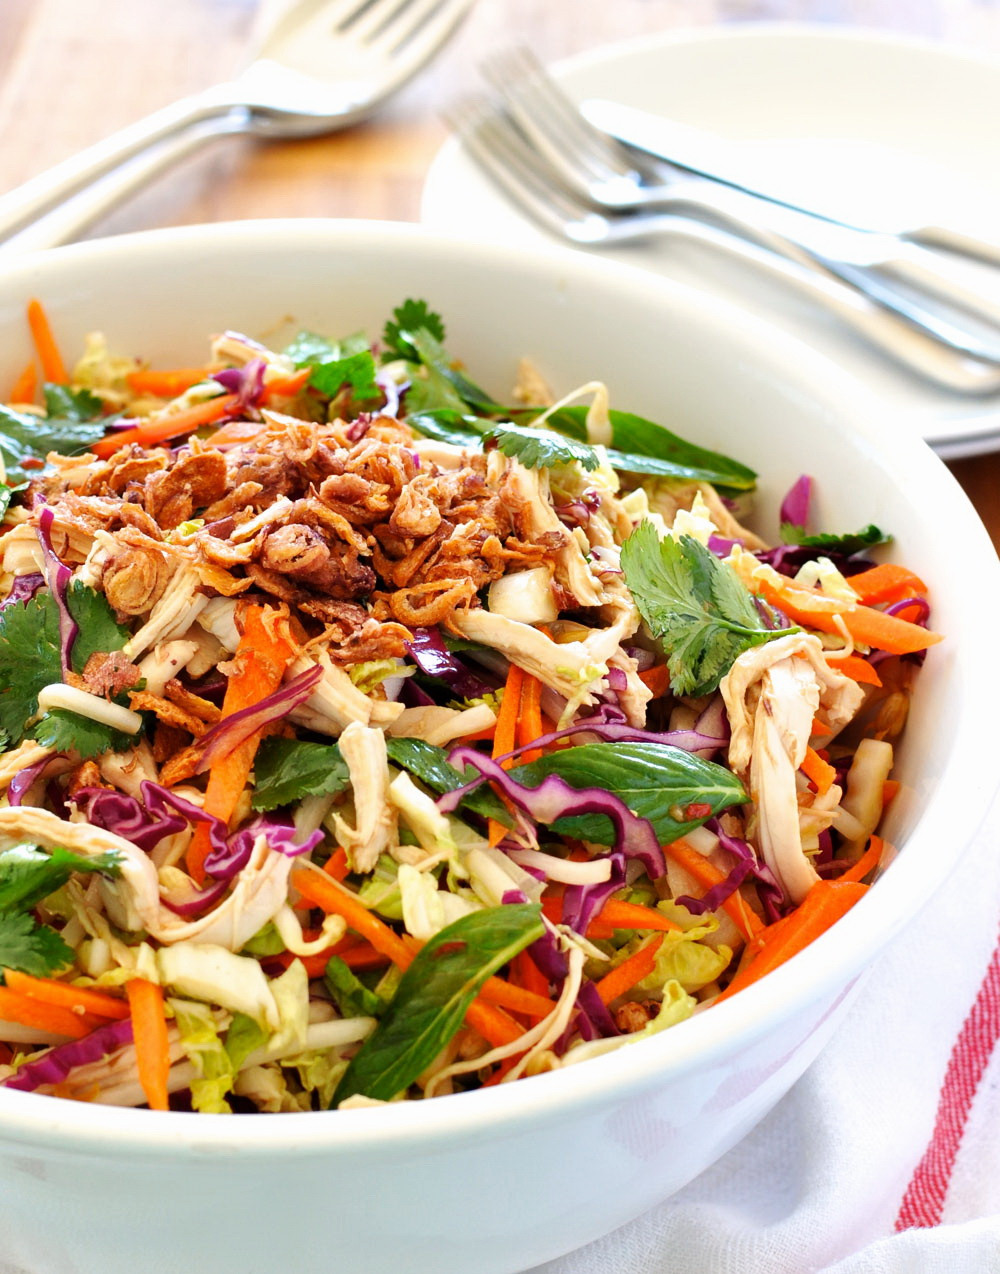 Healthy Asian Chicken Recipes  Crunchy Asian Chicken Salad – Best Fast Healthy Weight